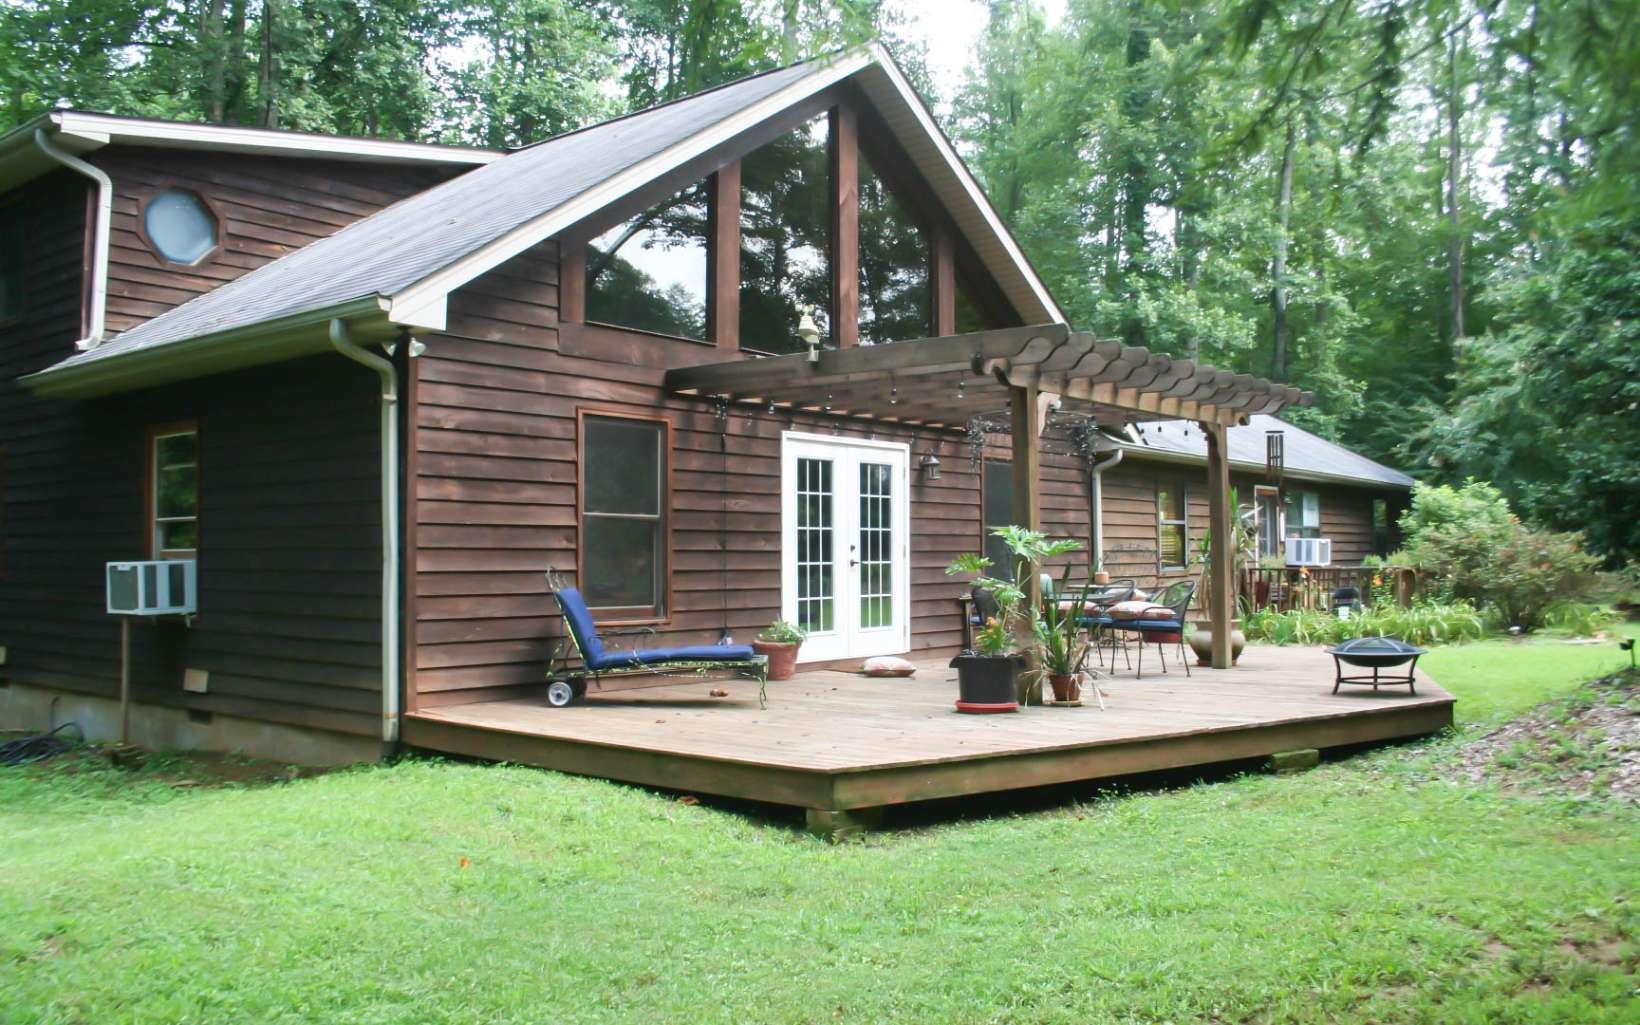 Blue Ridge Ga Real Estate | North Georgia Real Estate ... on